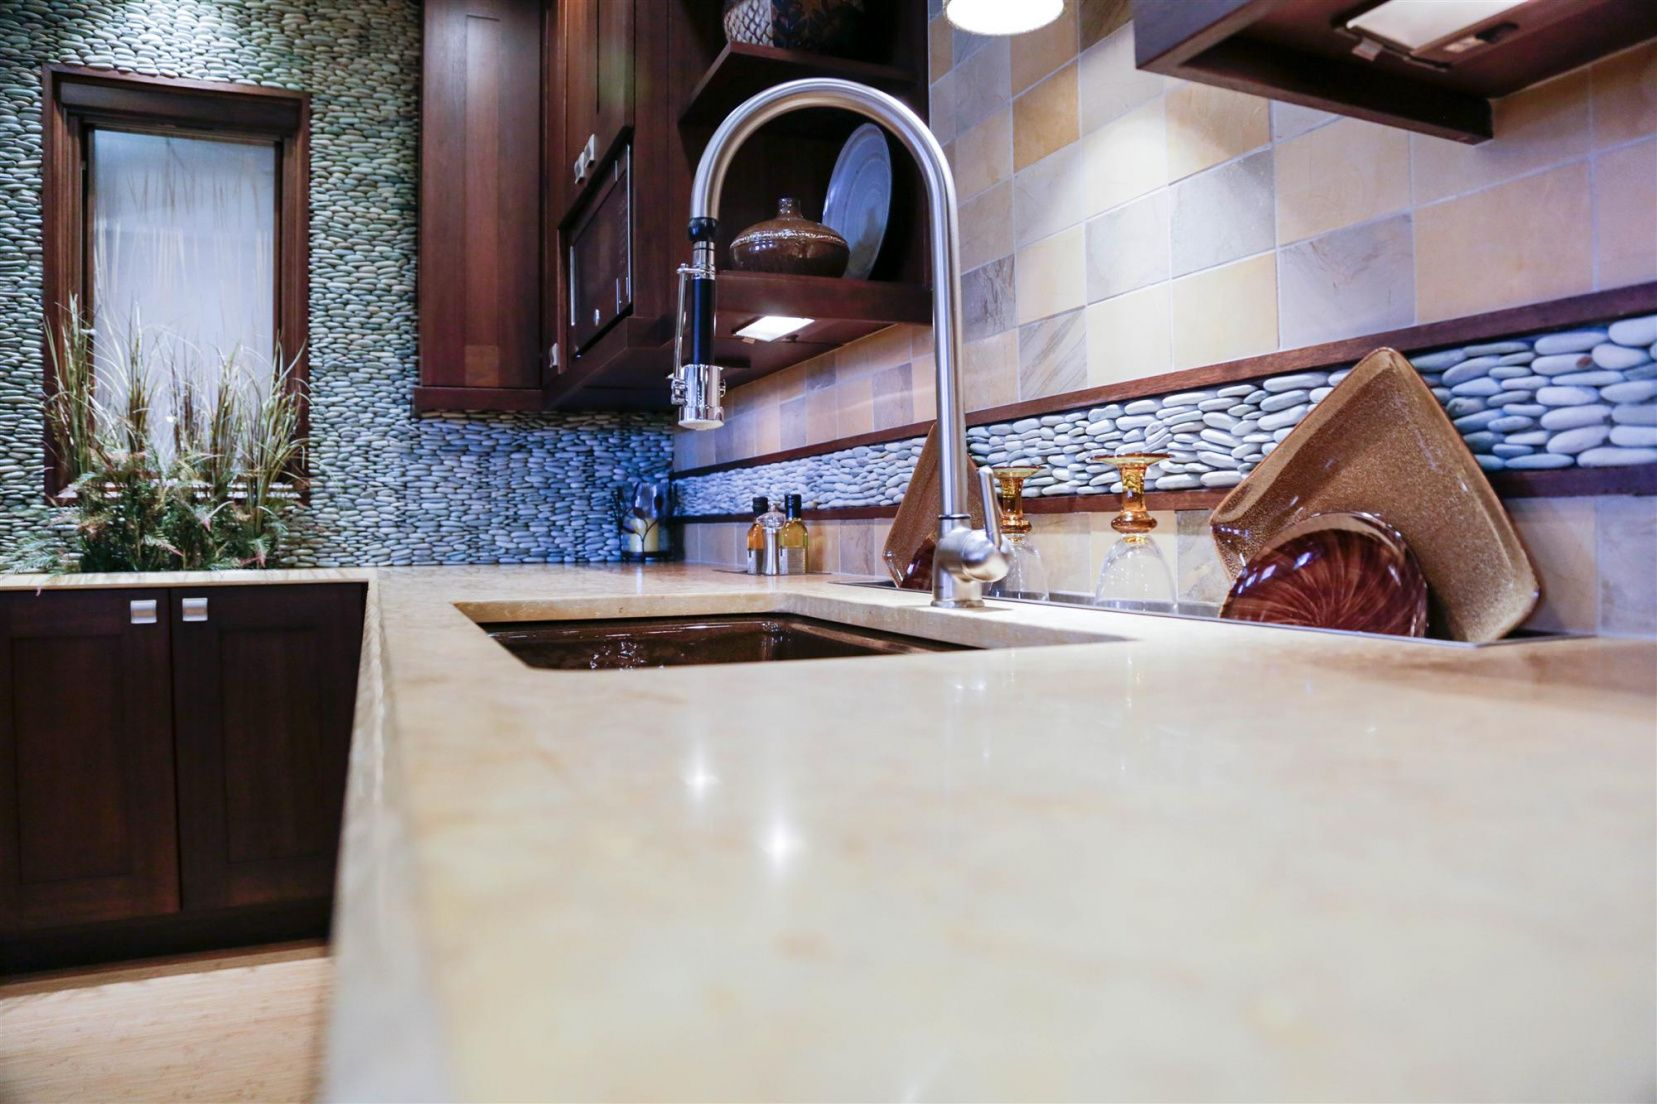 77 Quartz Countertops Milwaukee Backsplash For Kitchen Ideas Check More At Http